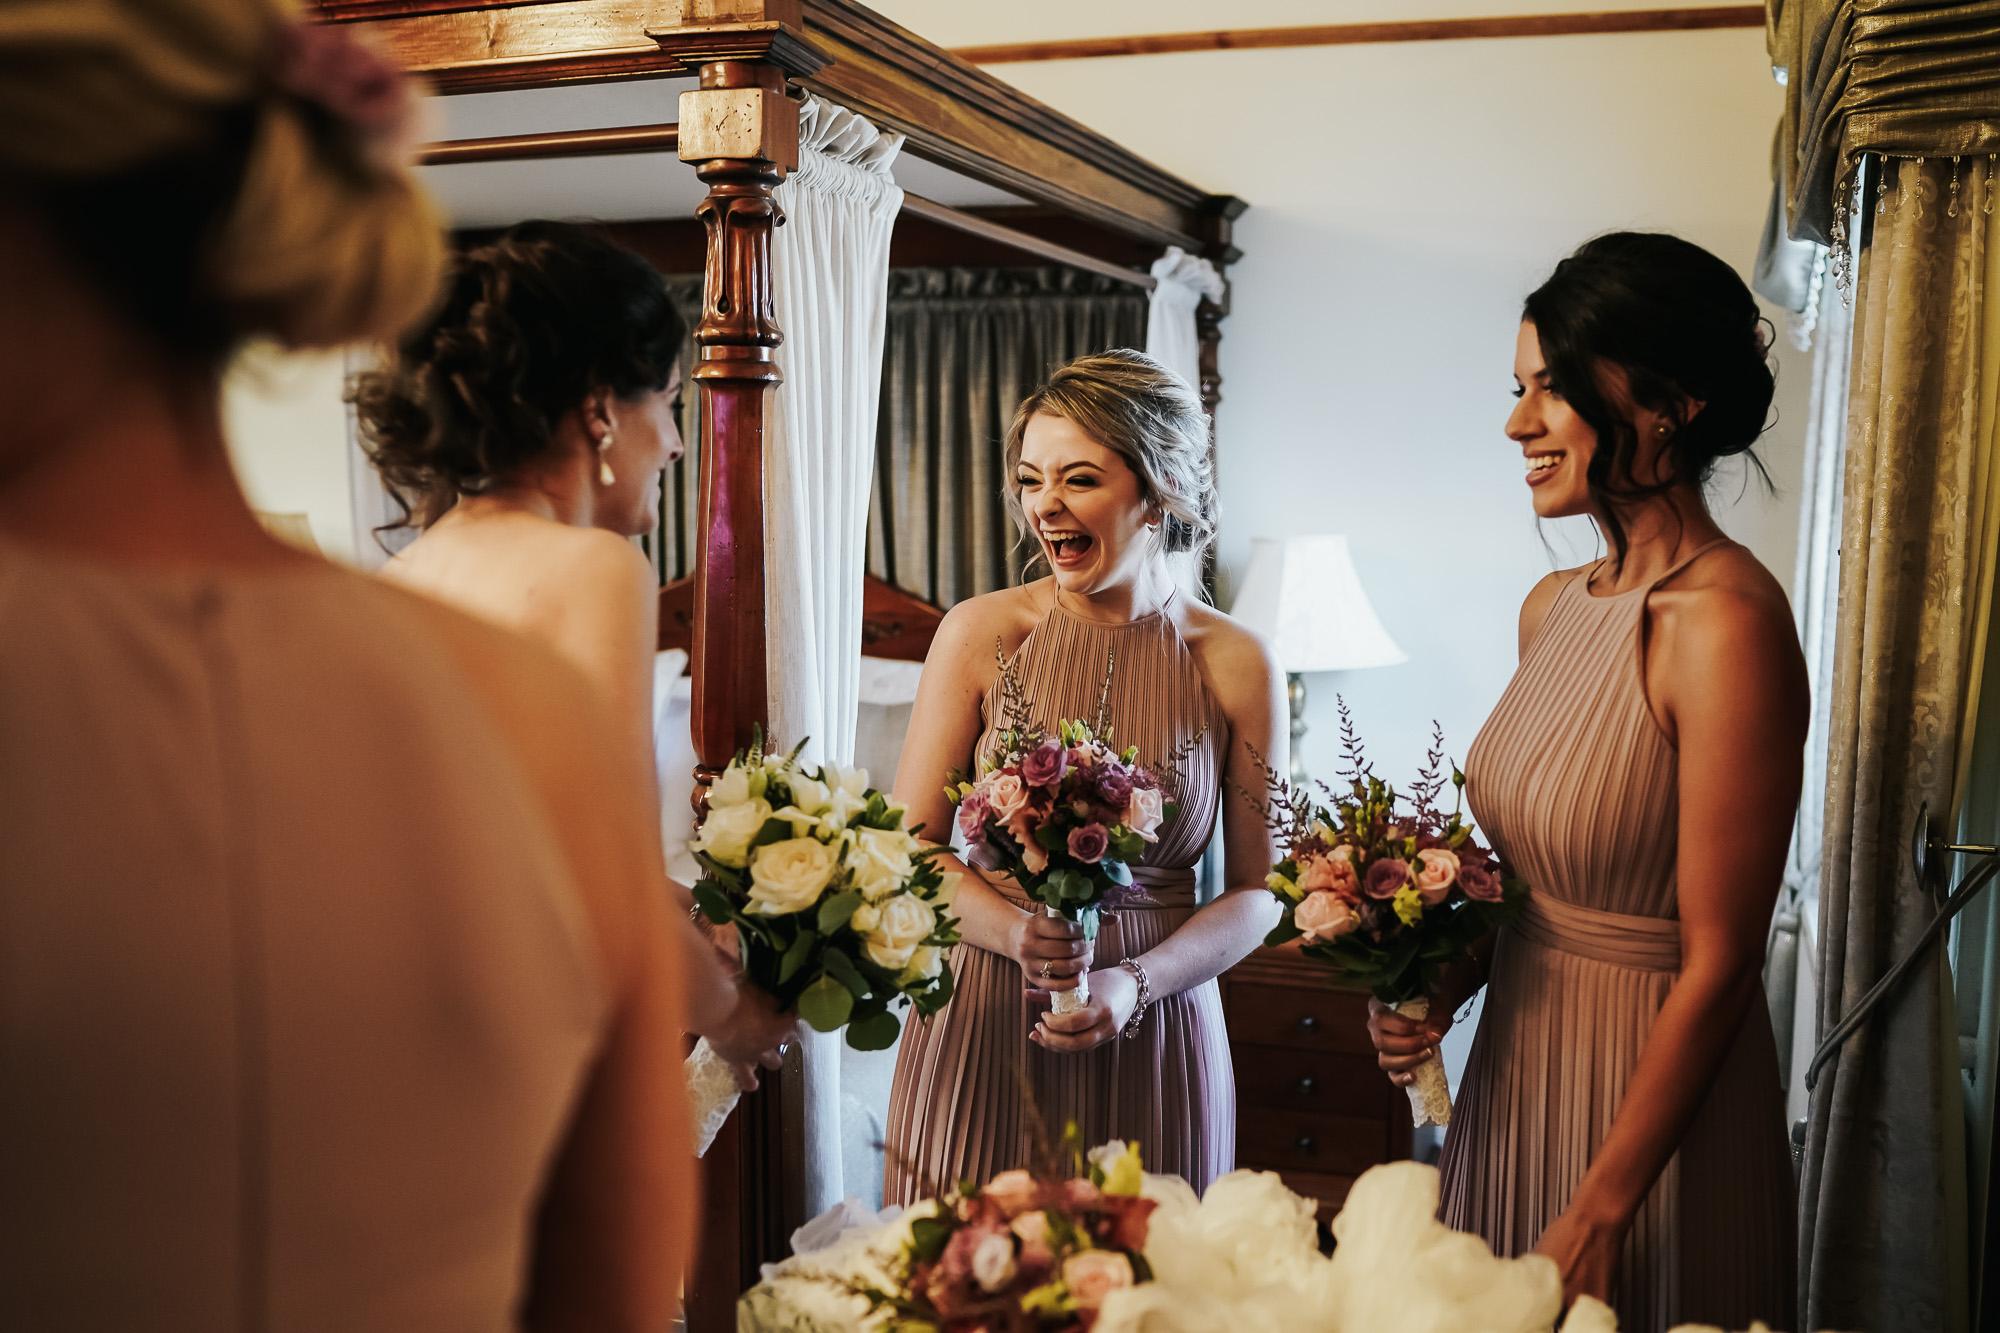 West Tower Wedding Venue Orkskirk Lancashire Wedding Photography cheshire wedding photographer (7 of 47).jpg